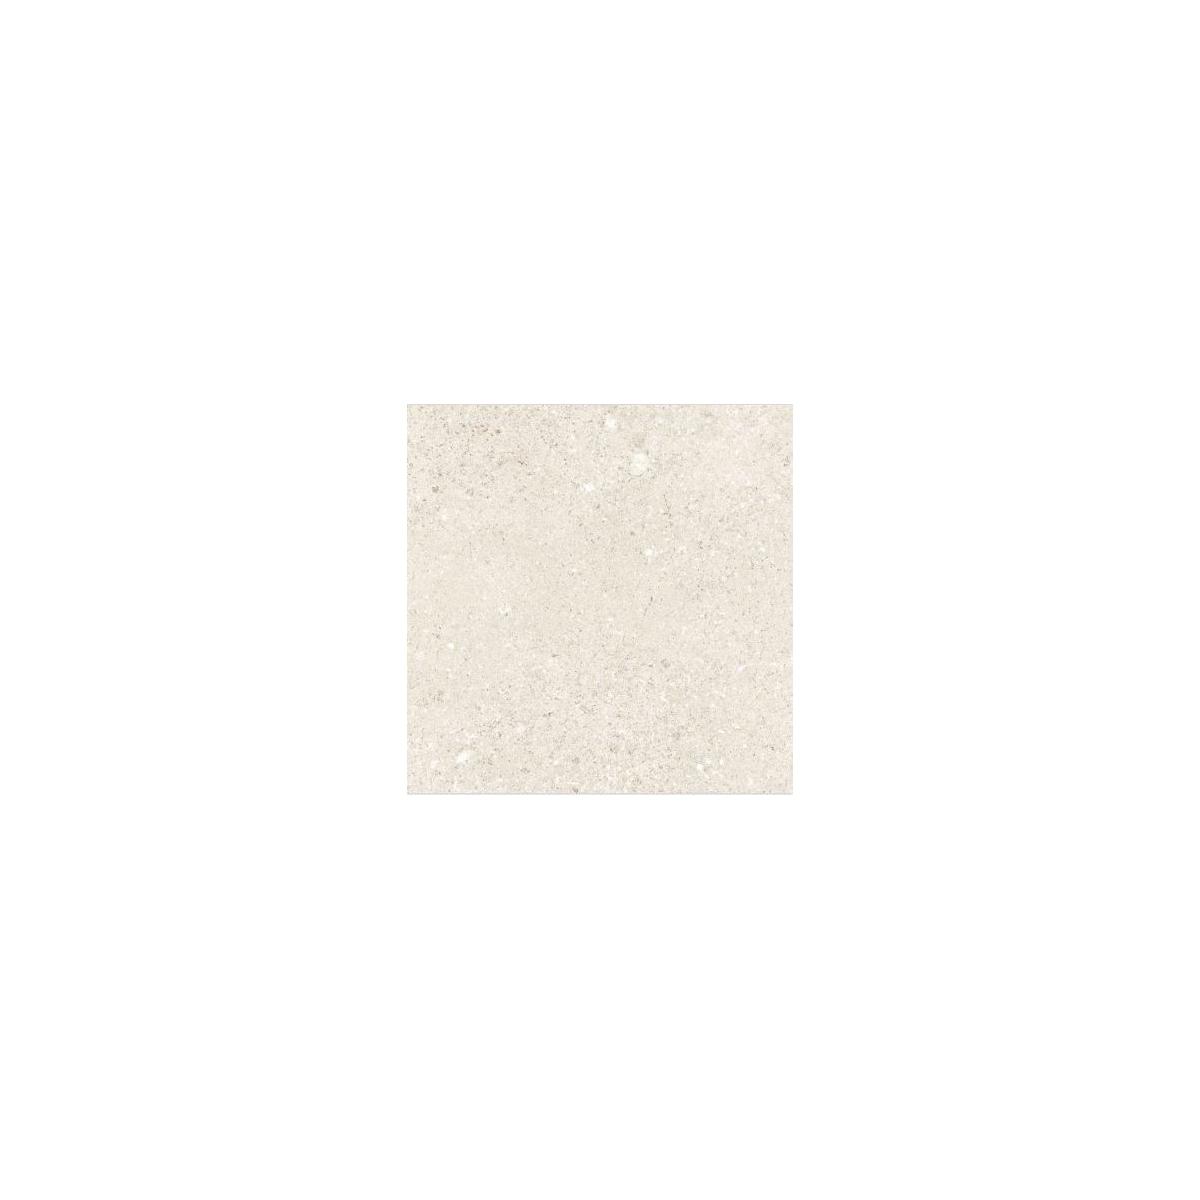 Losas Nassau Crema 20x20 (m2) para interior y exterior